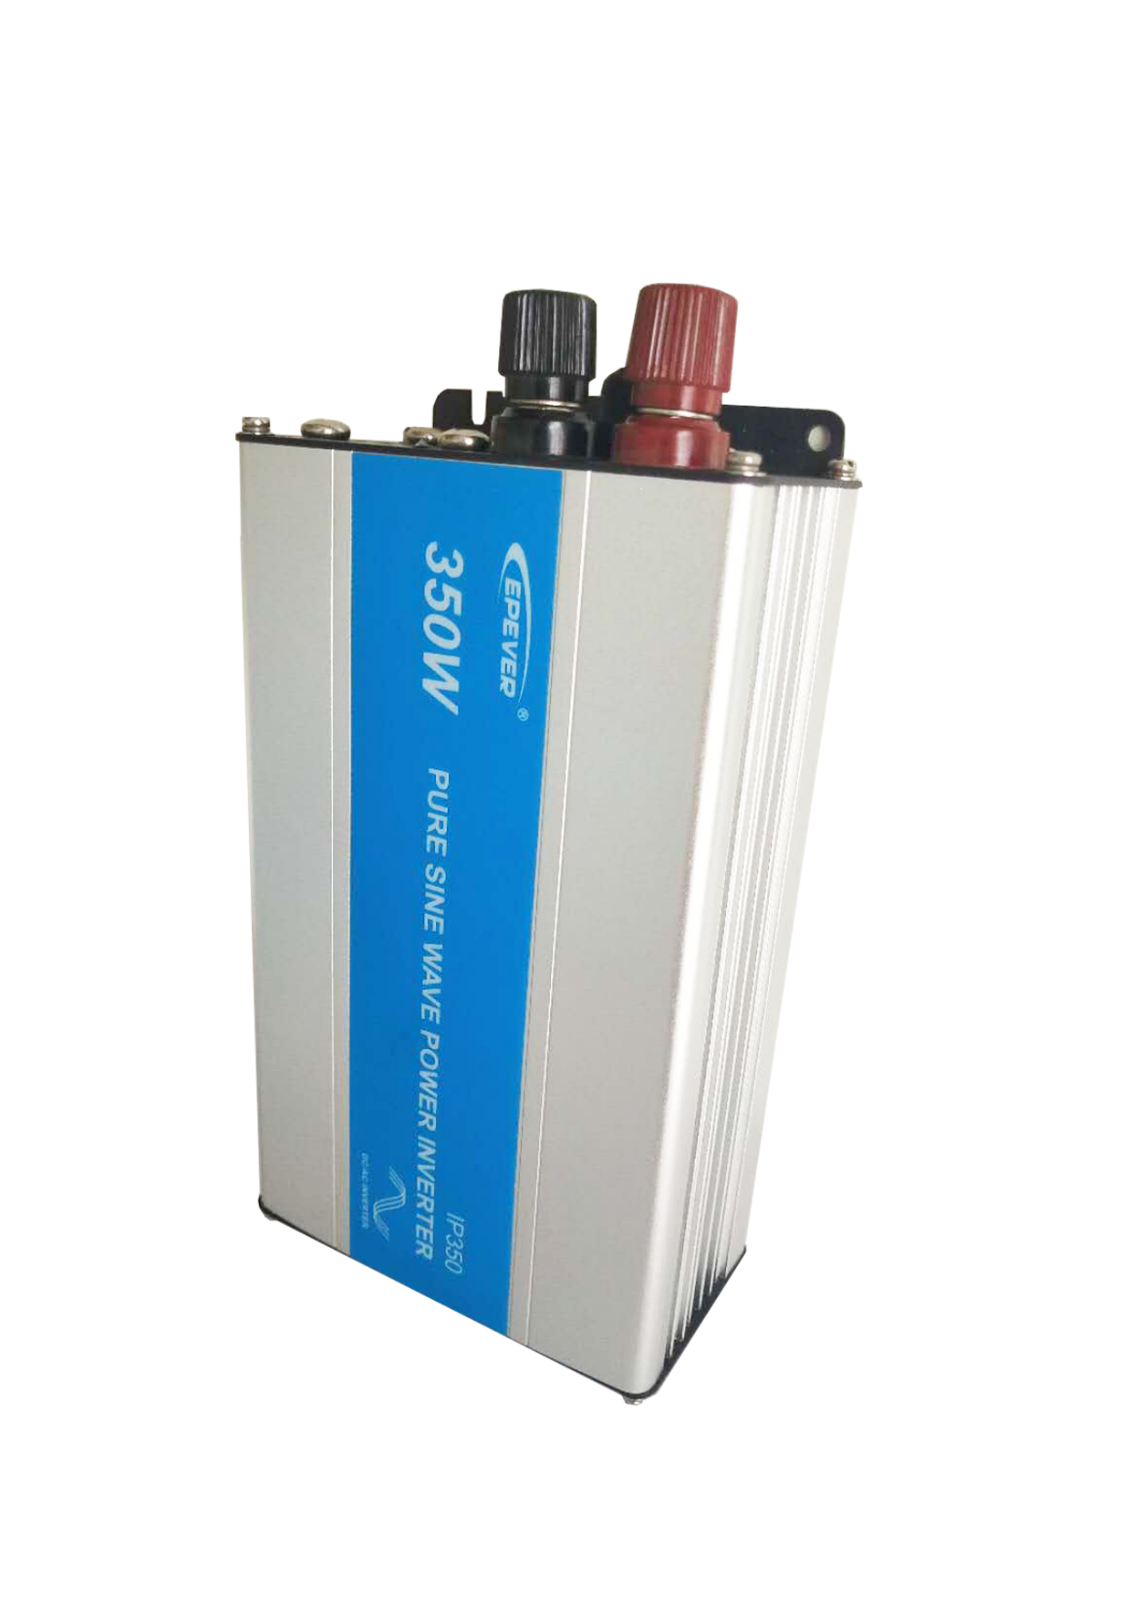 EPEVER® IP350 reiner Sinus Spannungswandler Spannungswandler Spannungswandler 350W 24V-230V Wechselrichter 15bdef